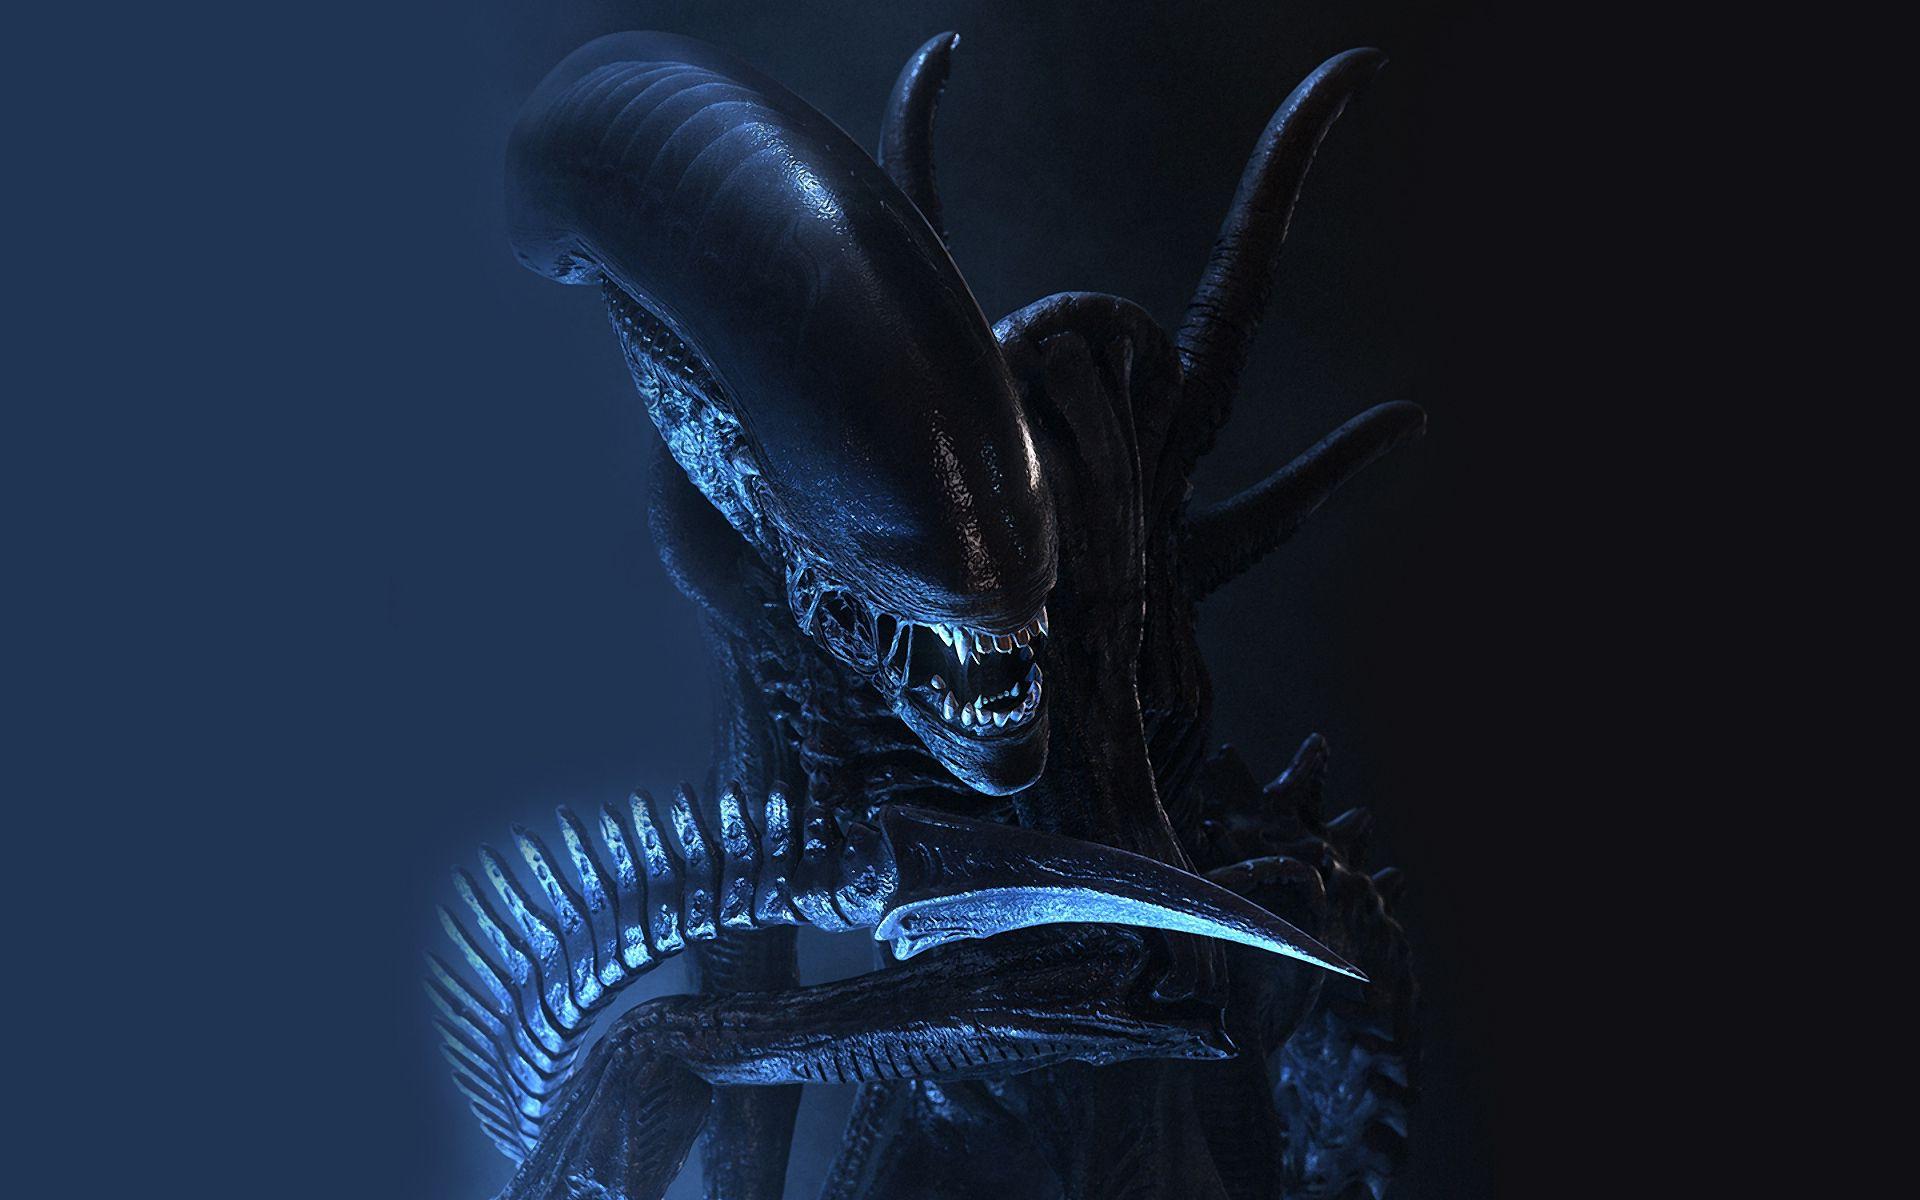 A Mean Looking Xenomorph From Alien 2 Xenomorph Giger Alien Aliens Movie